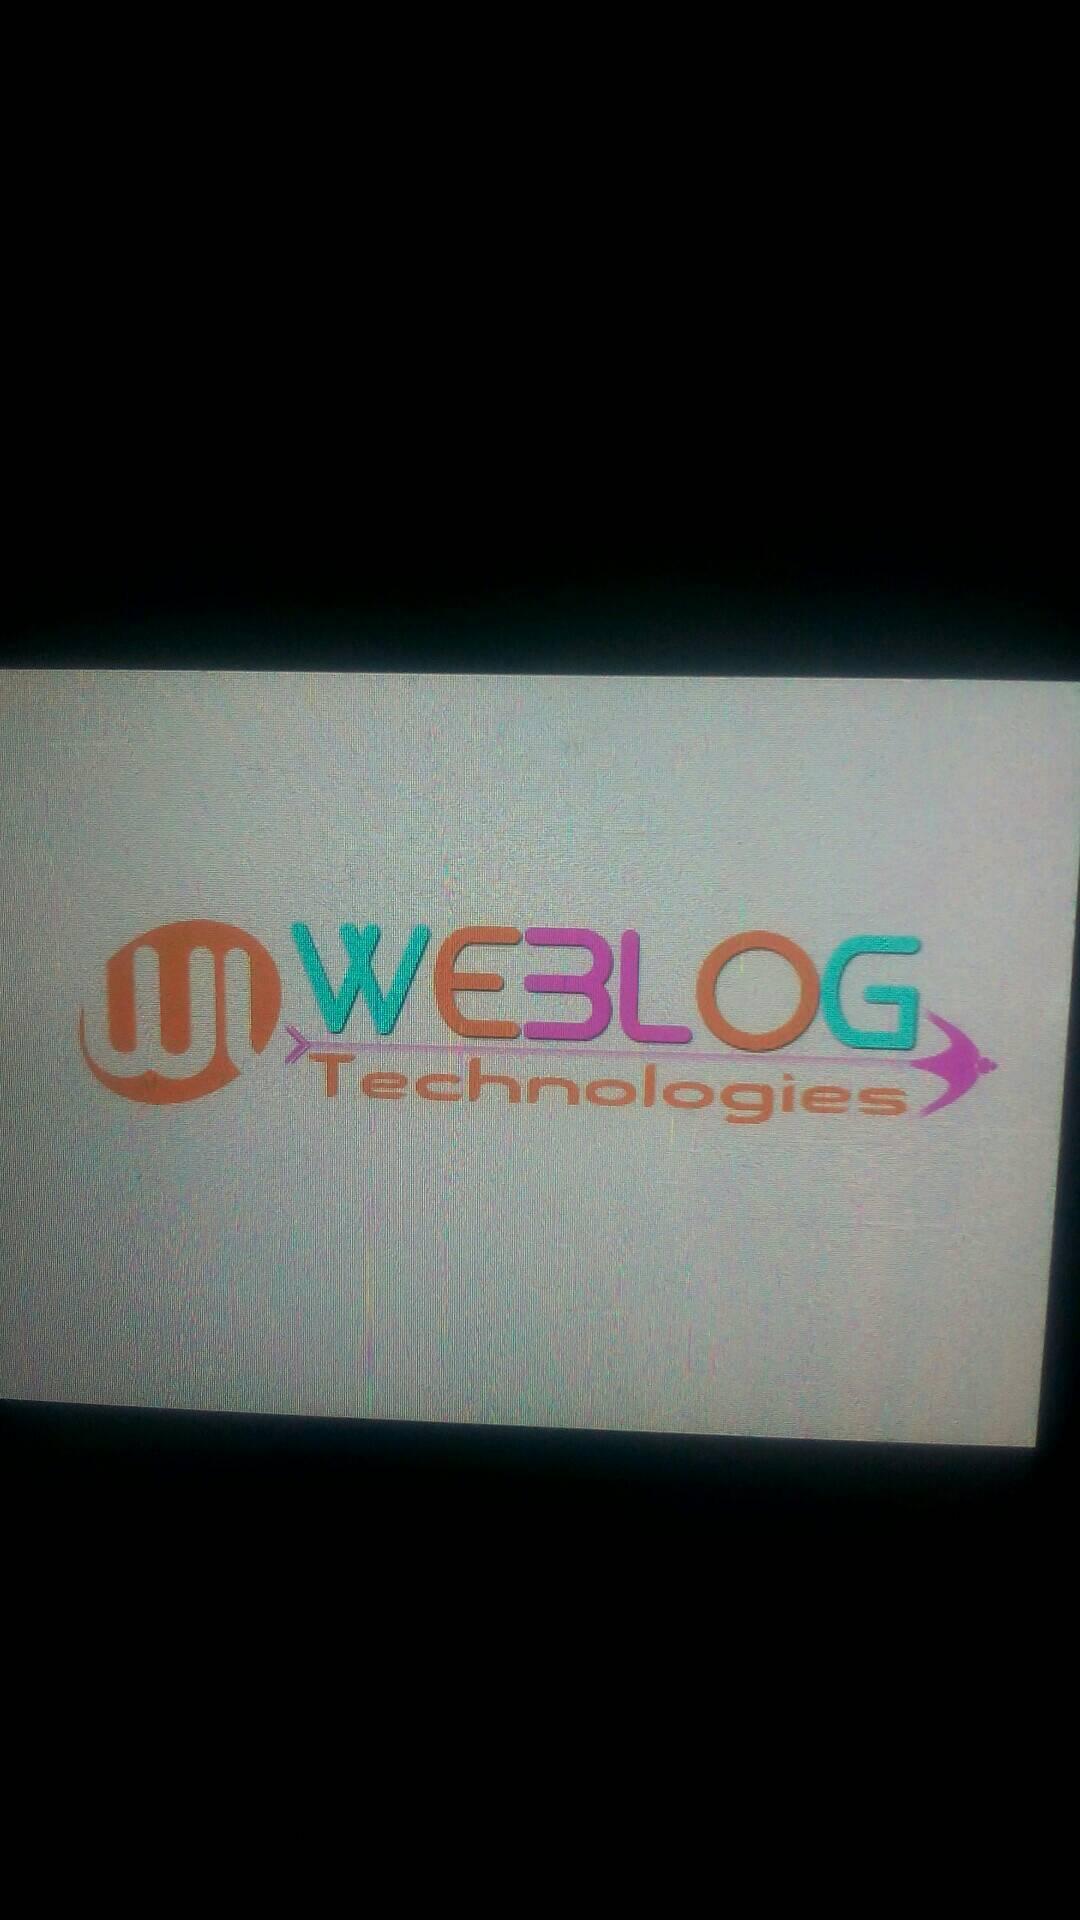 WebLog Technologies 9865828680 - logo